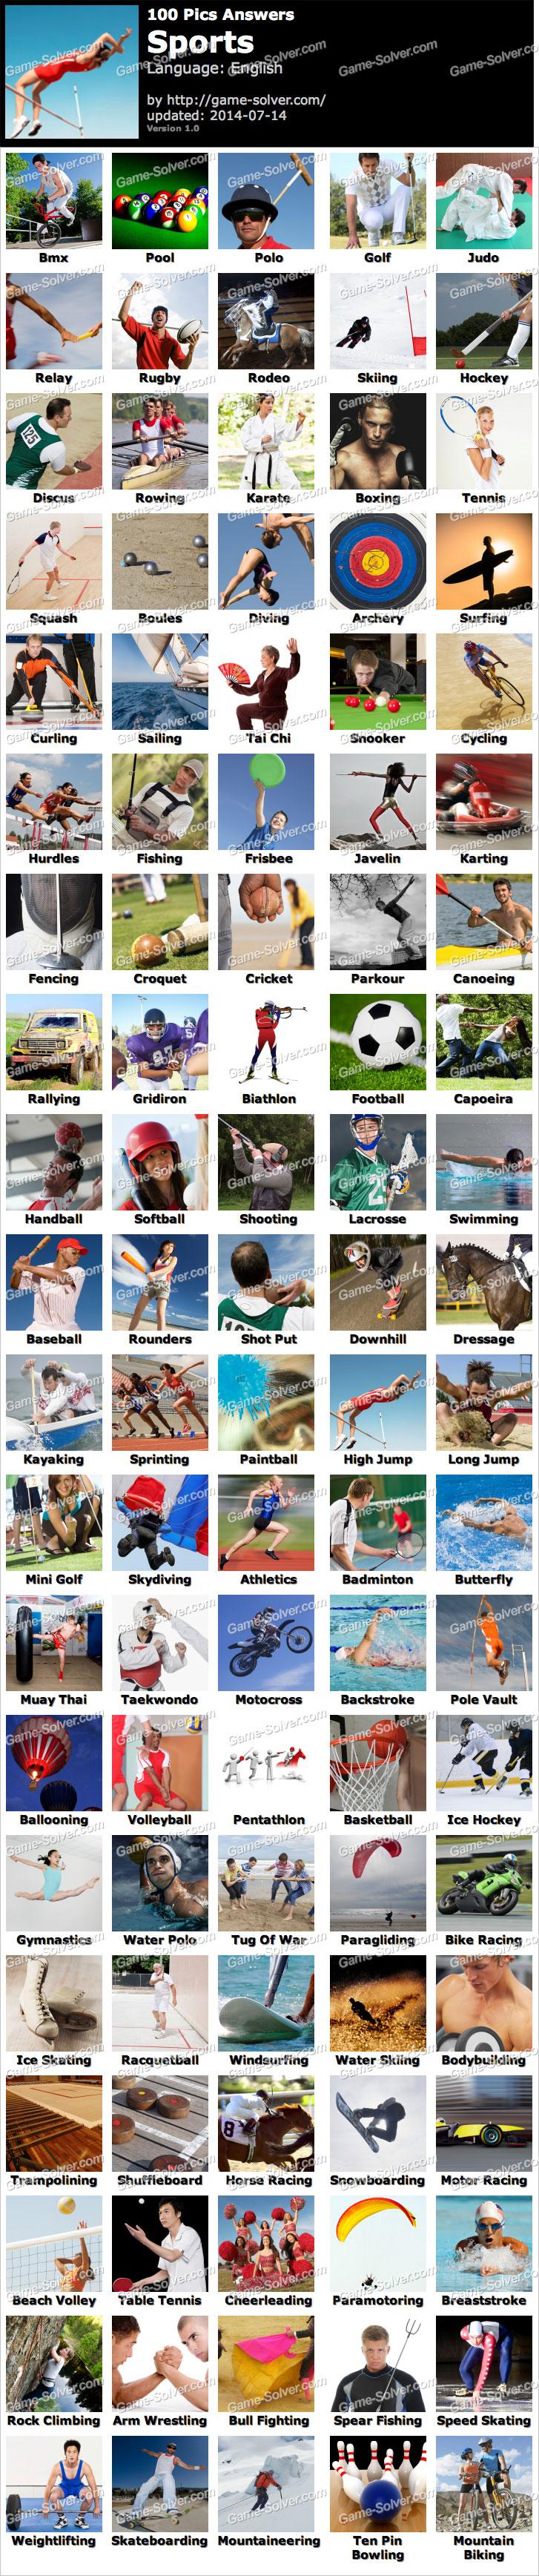 100 Pics Sports